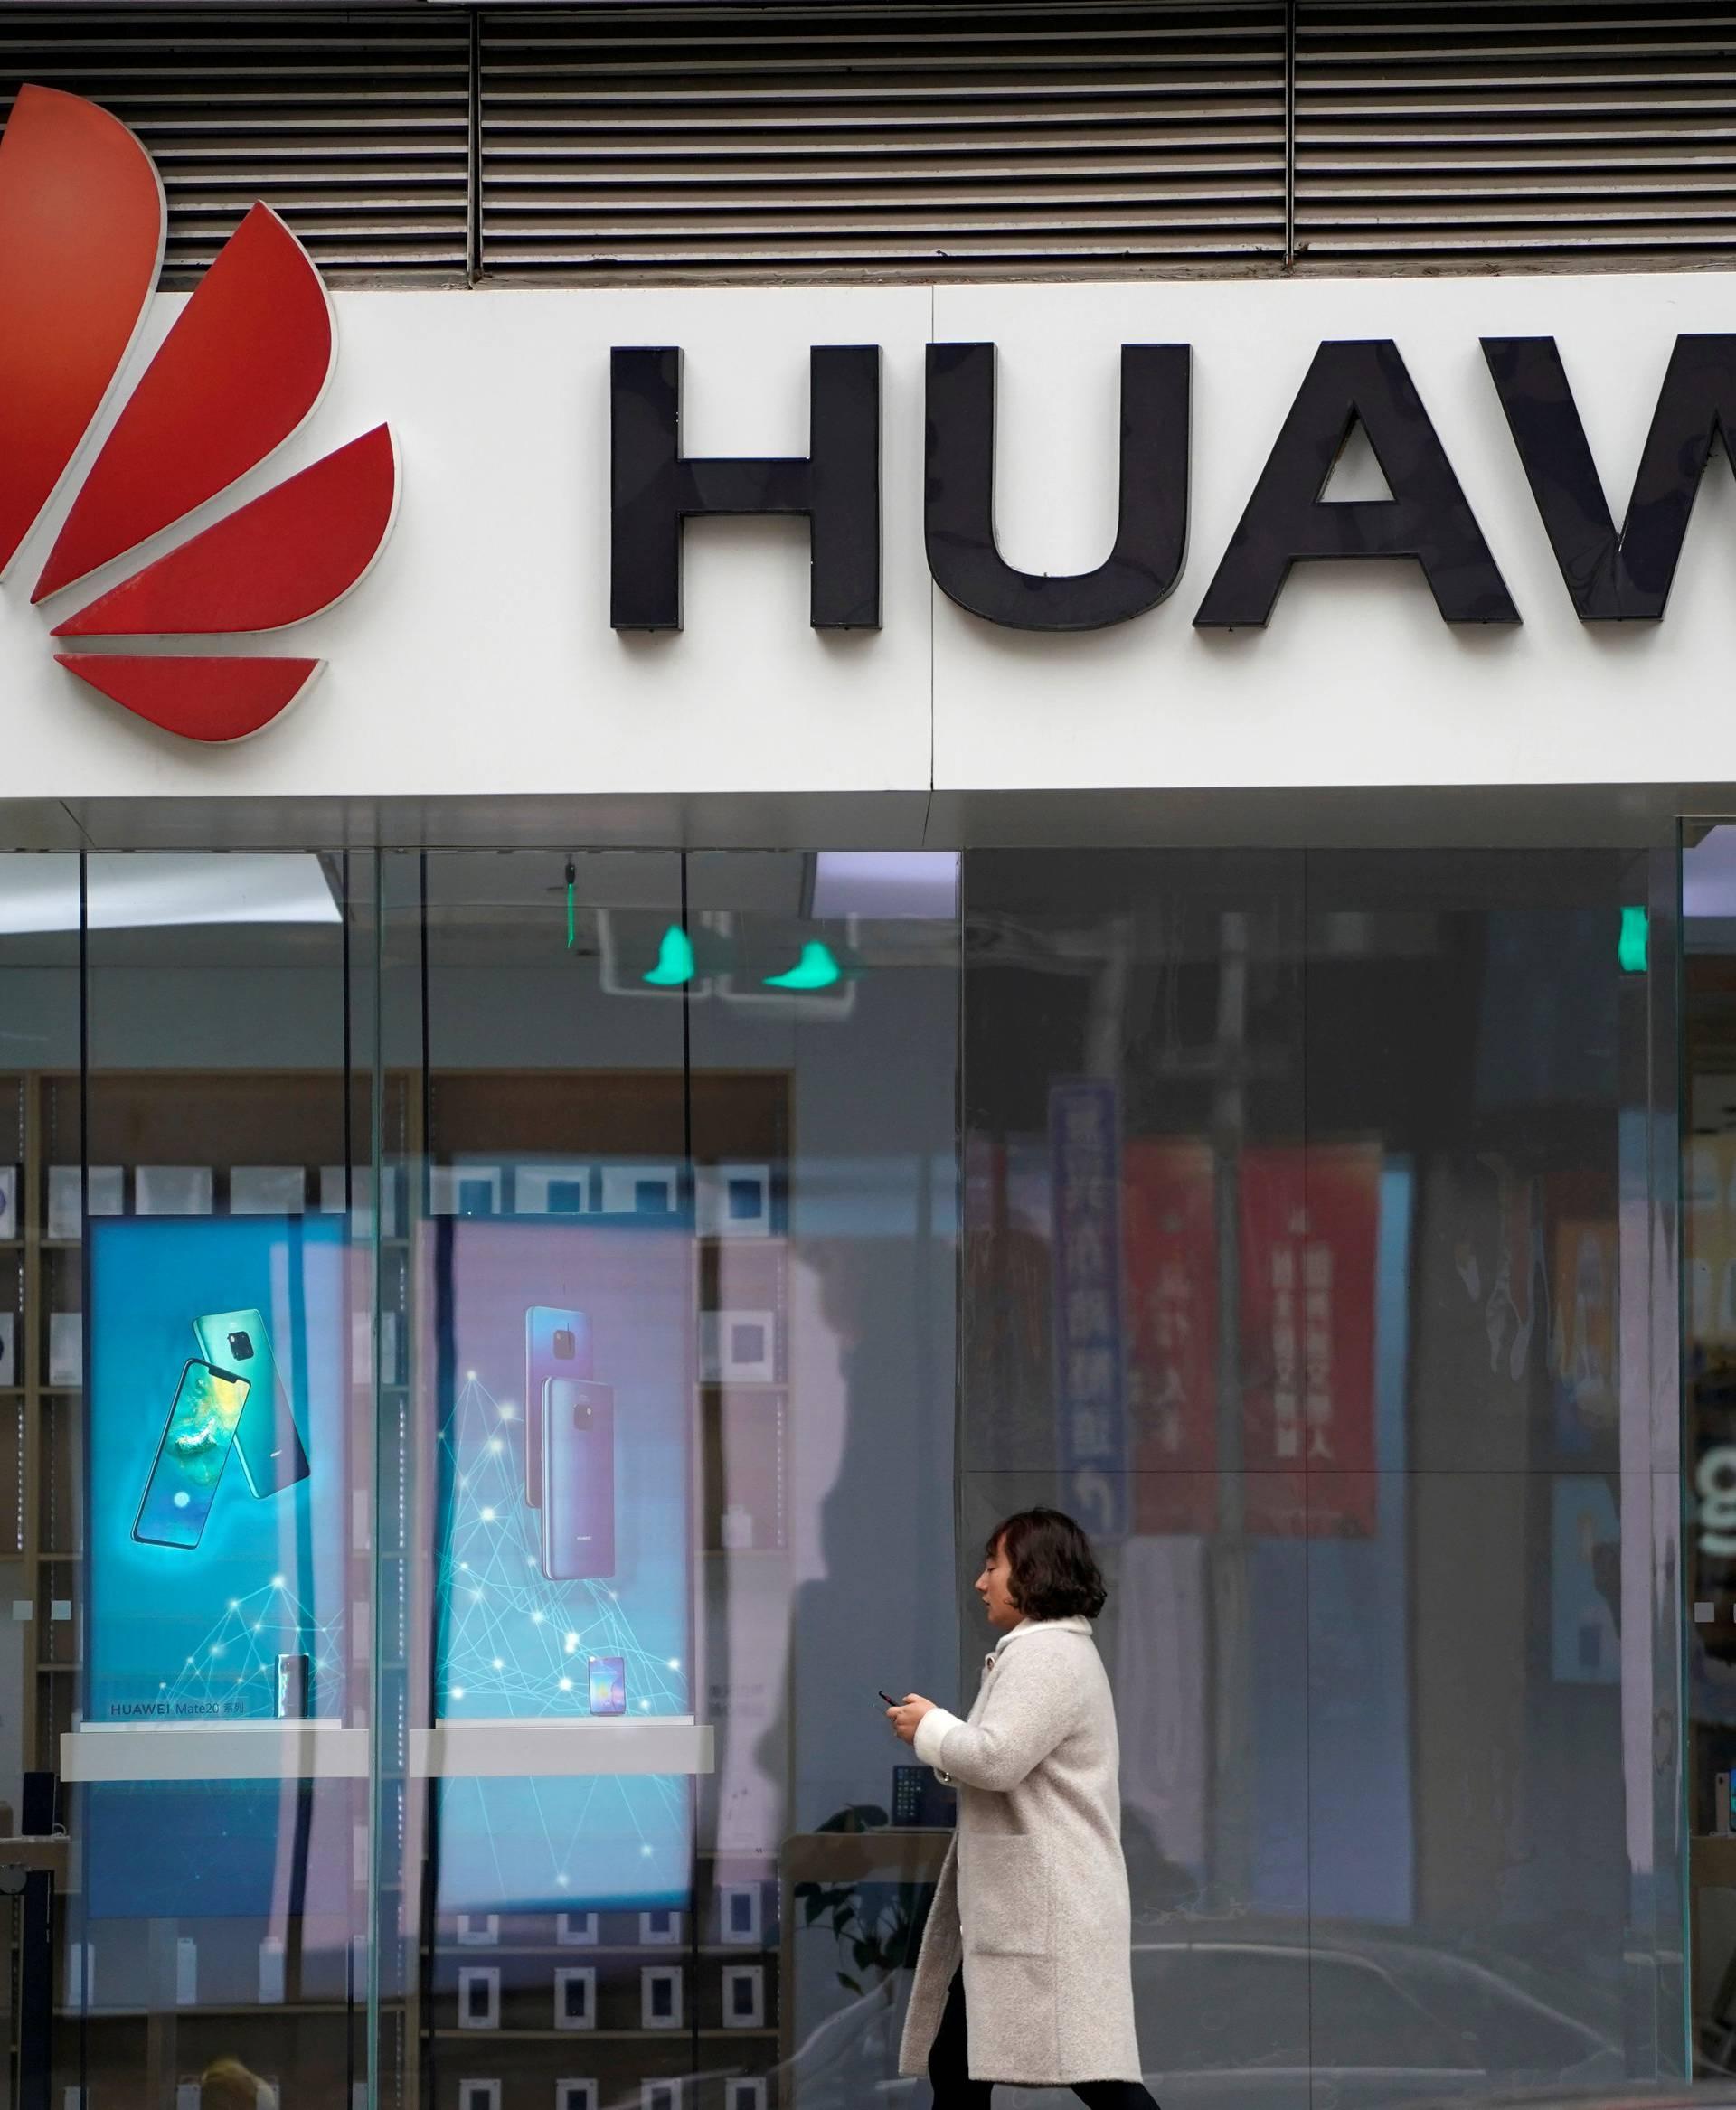 FILE PHOTO: A woman walks by a Huawei logo at a shopping mall in Shanghai